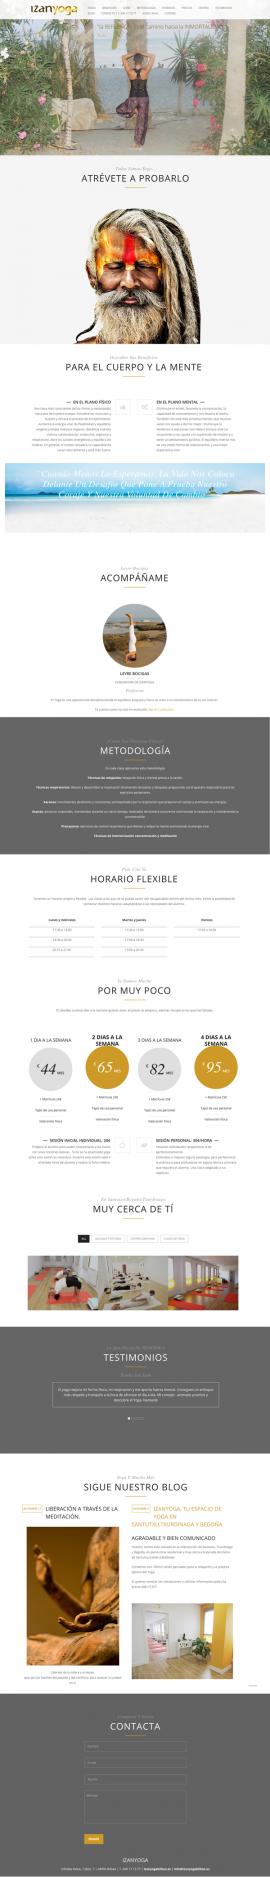 RABAJOS-3D3-WEB-PREMIUM-IZANYOGA